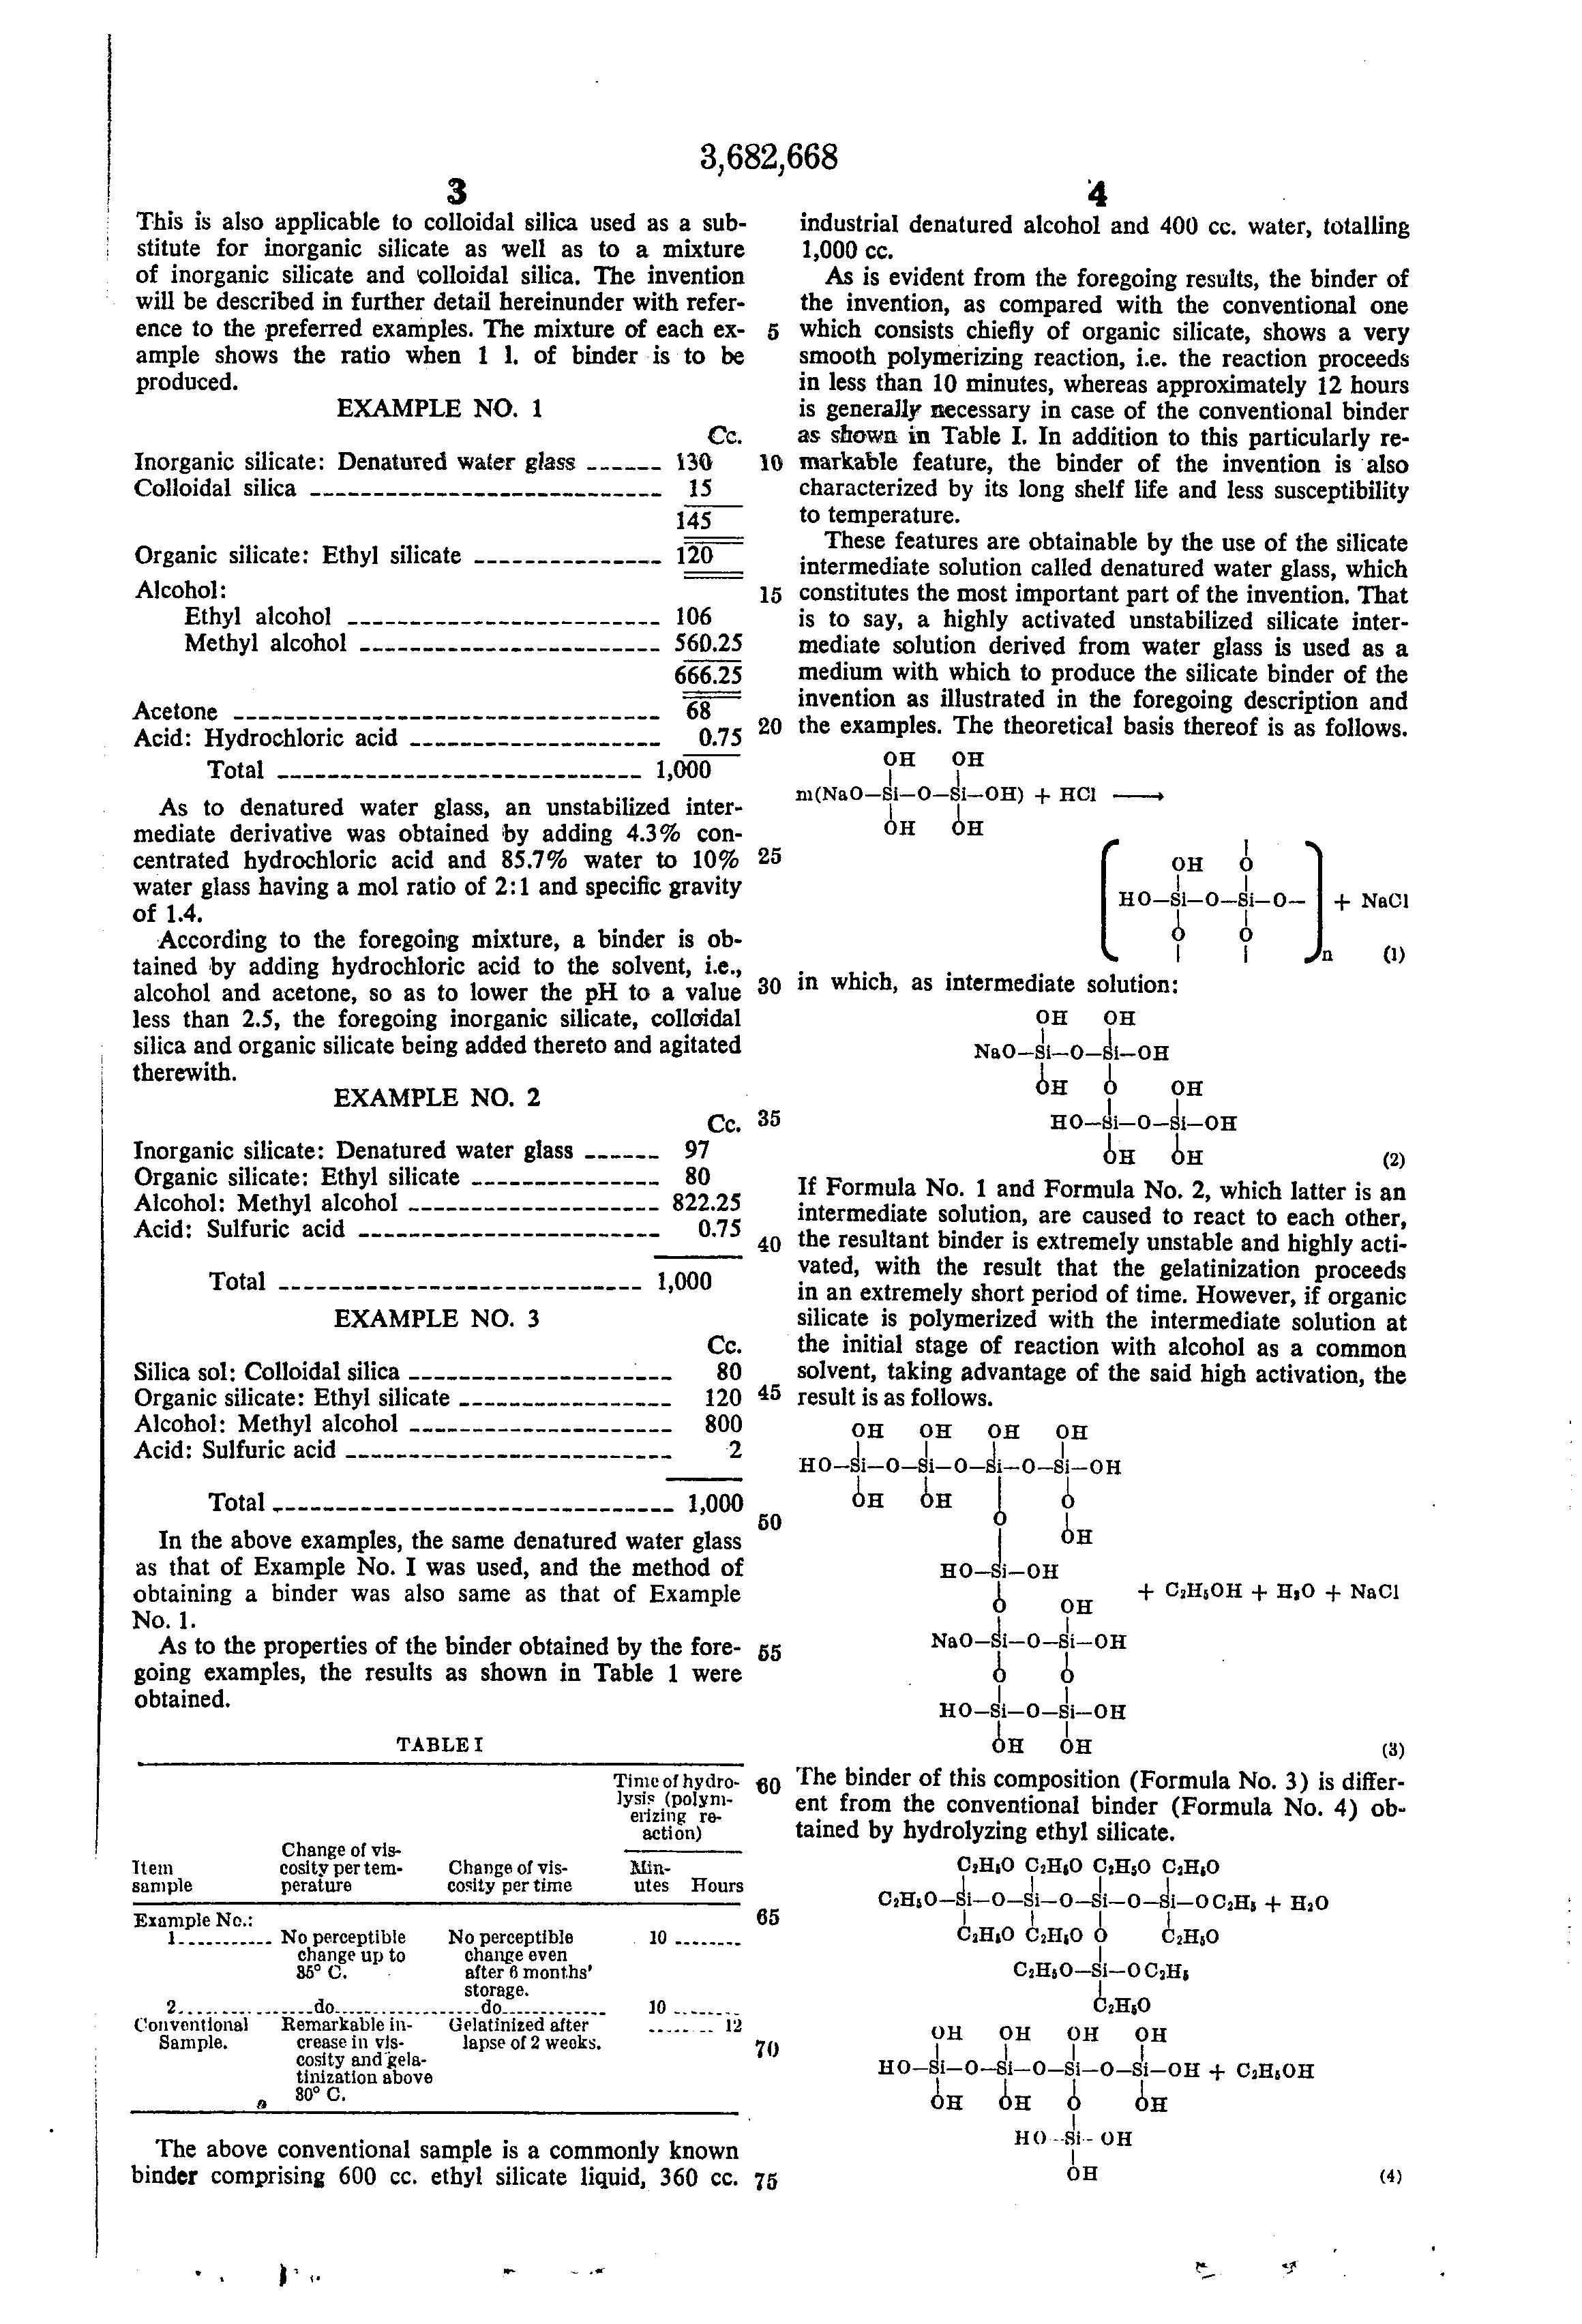 patent job extension throughout part